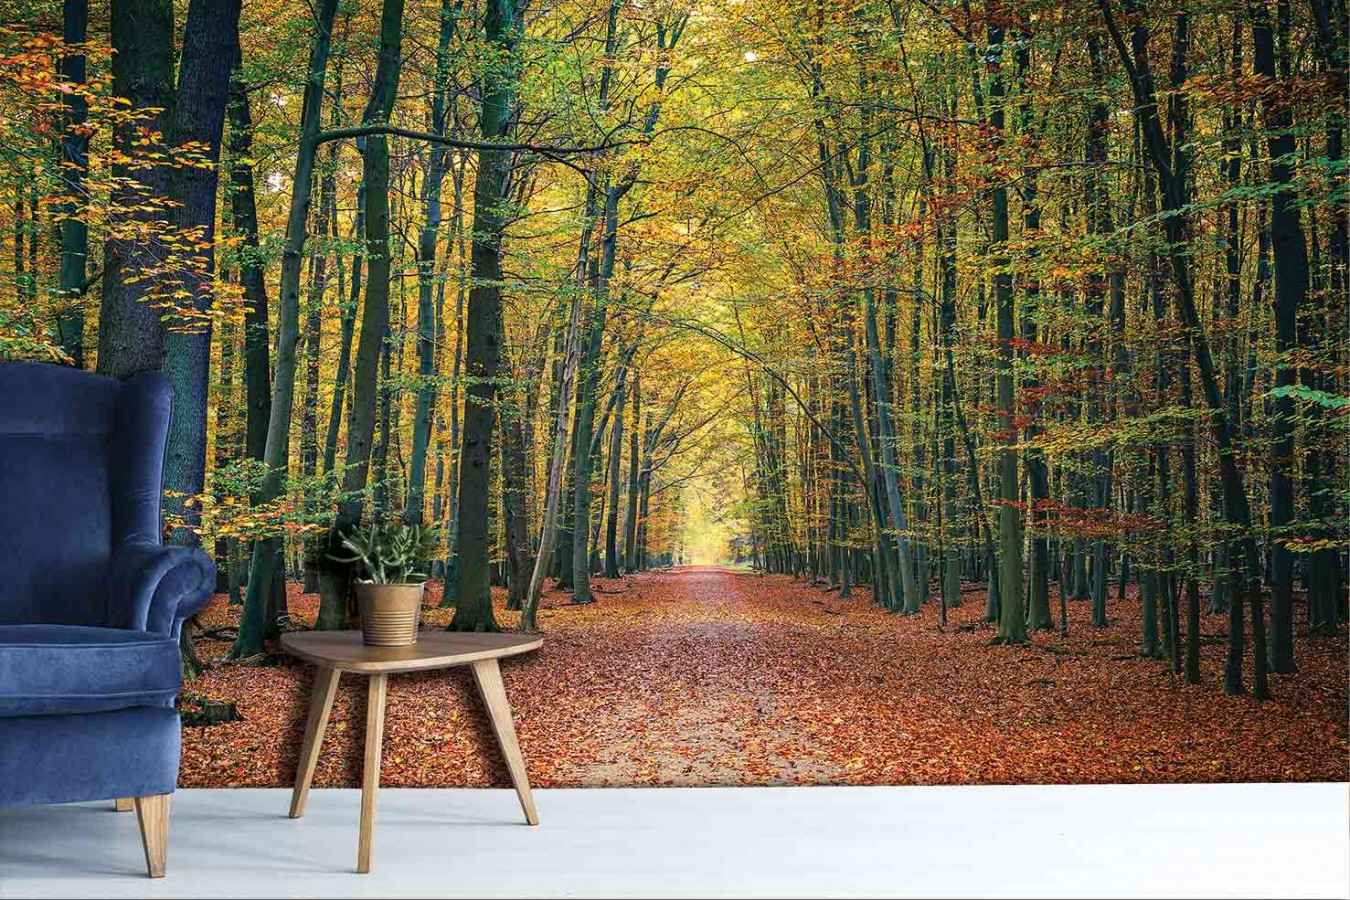 Fotomural Fall Landscape A08-M877   A08-M877